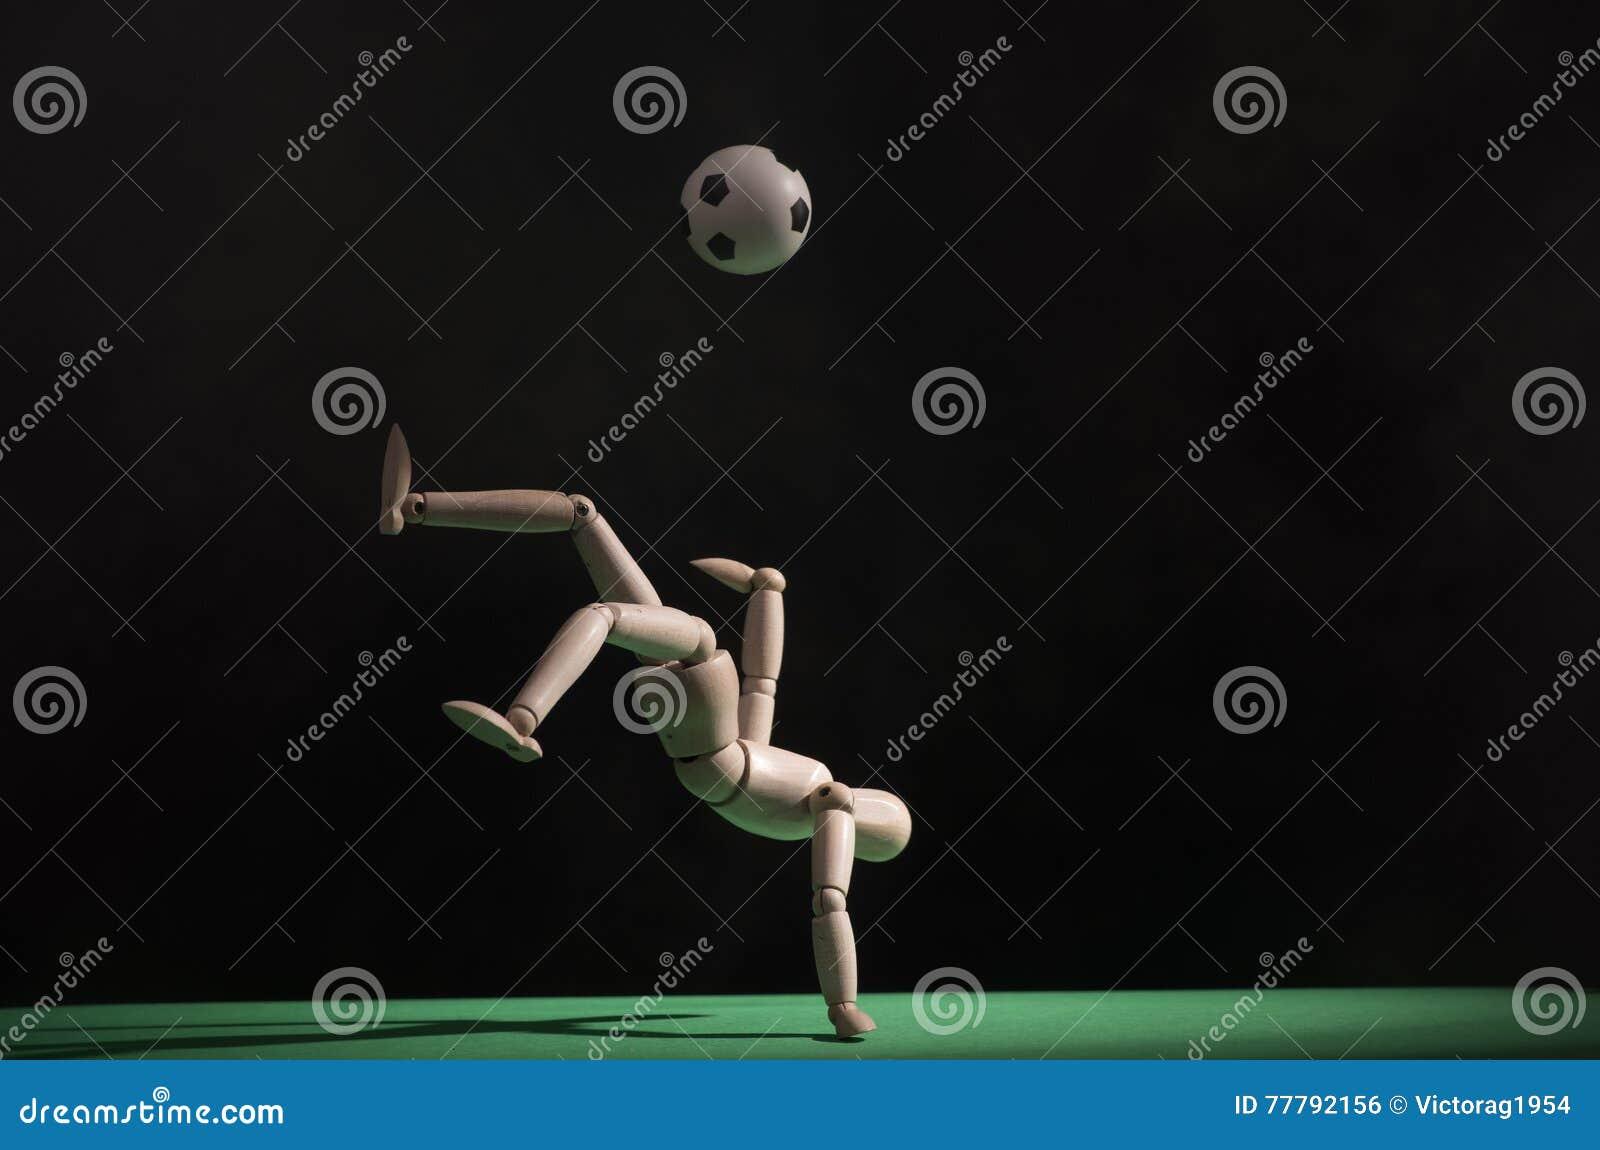 Ball player soccer